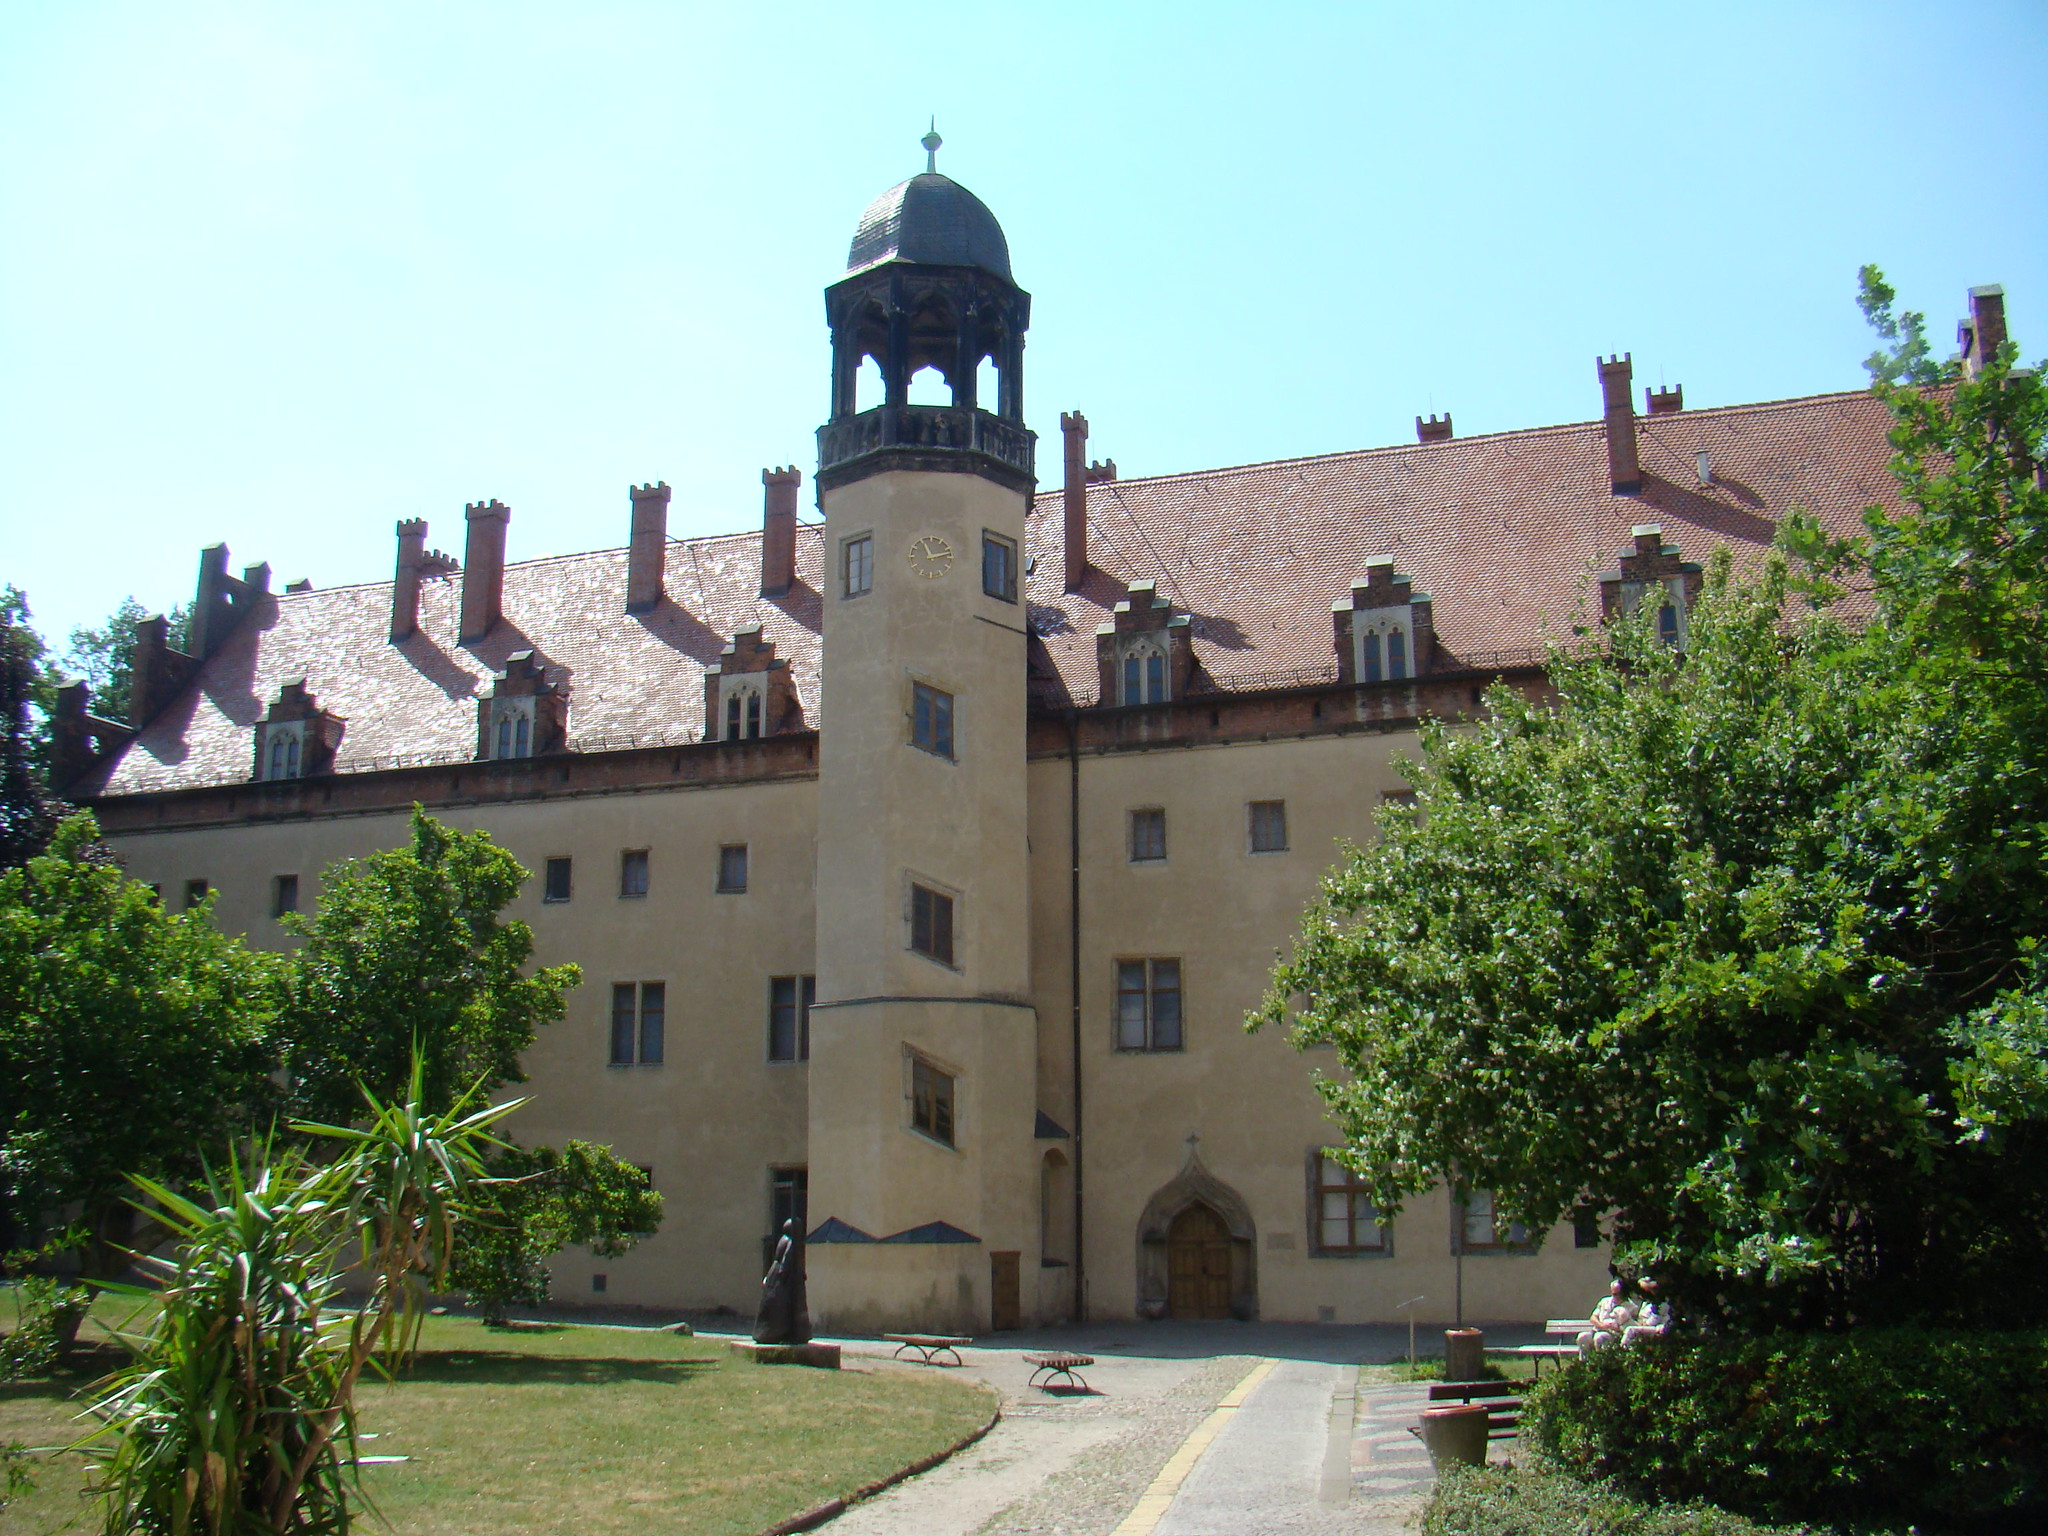 exterior Lutherhaus museo casa Lutero Wittenberg Lutherstadt Alemania Patrimonio de la Humanidad Unesco